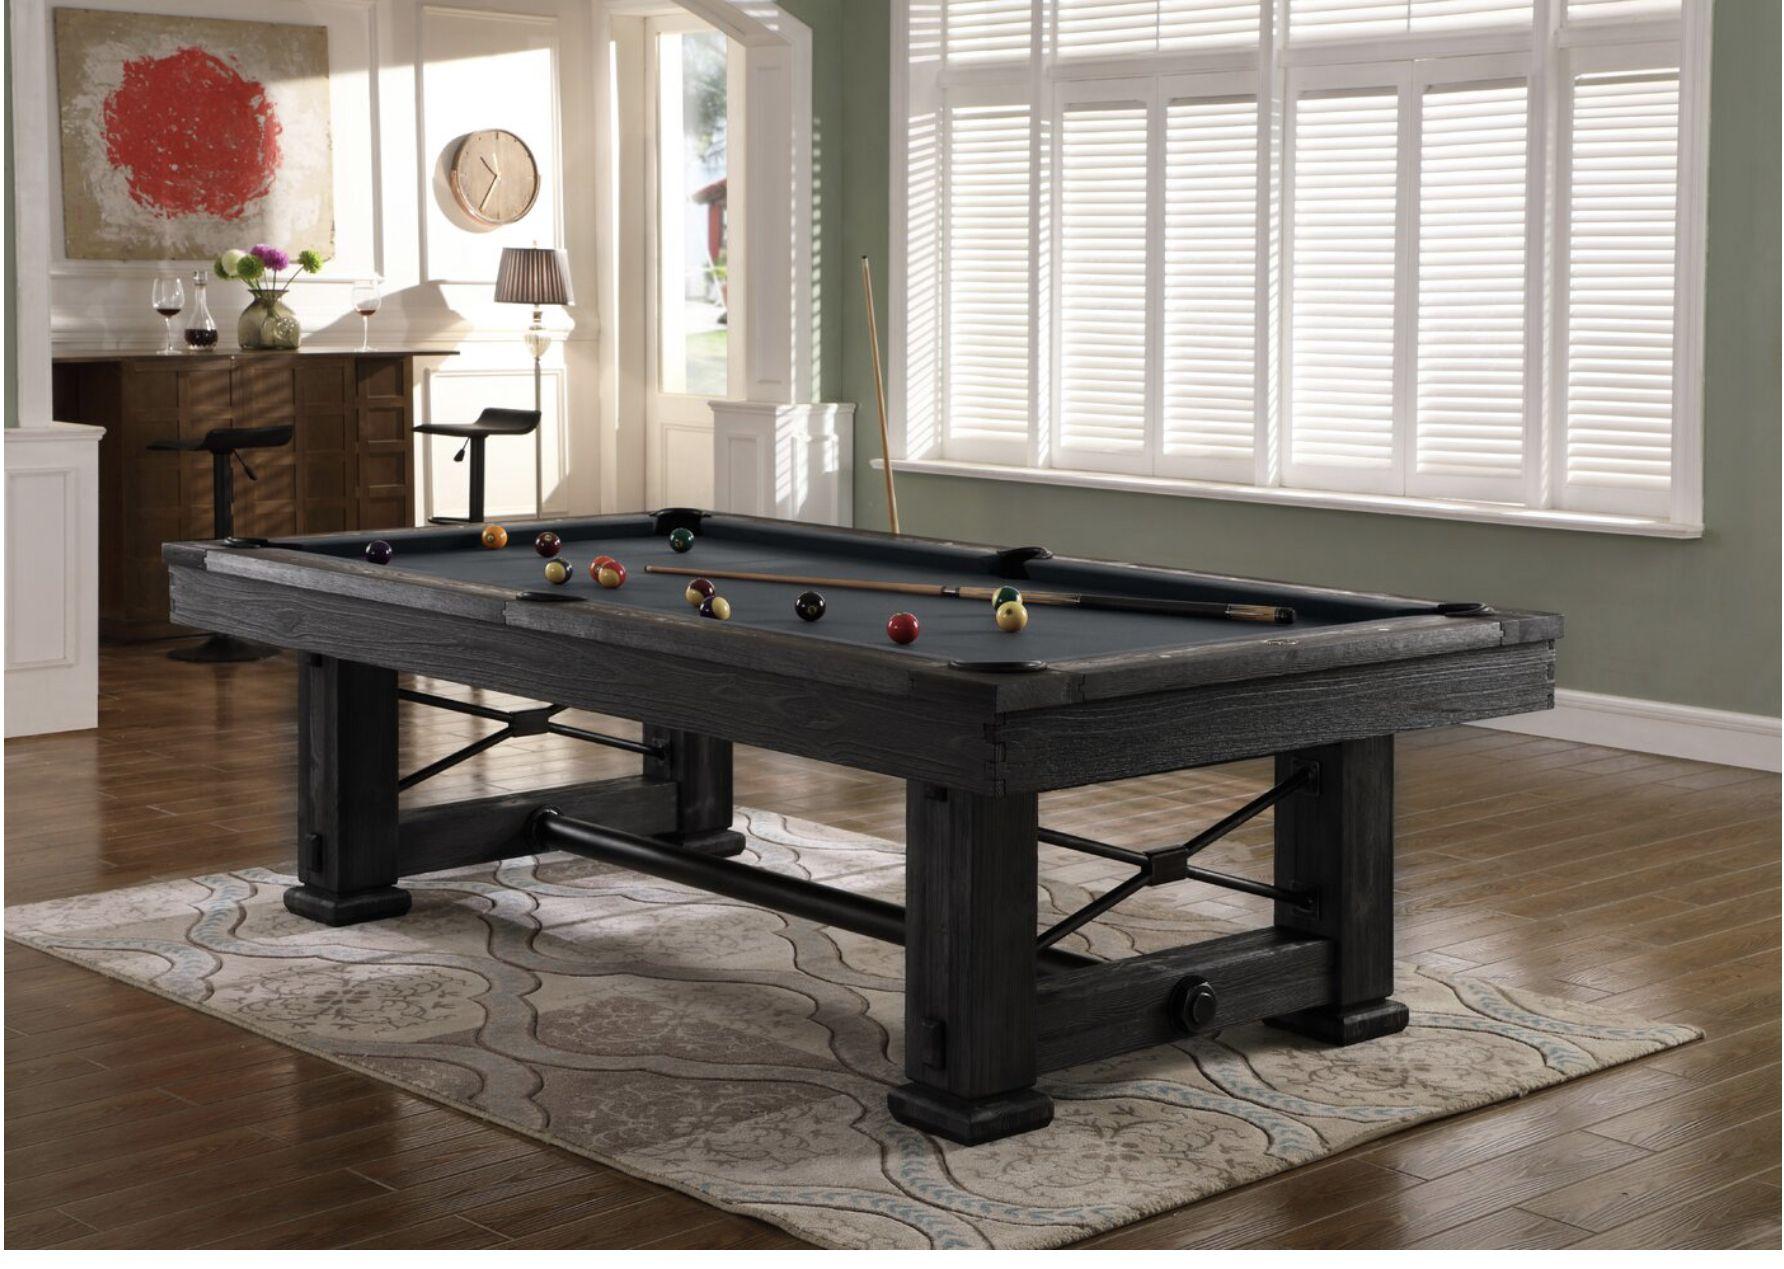 Weather pool table in 2020 Pool table slate, Pool table